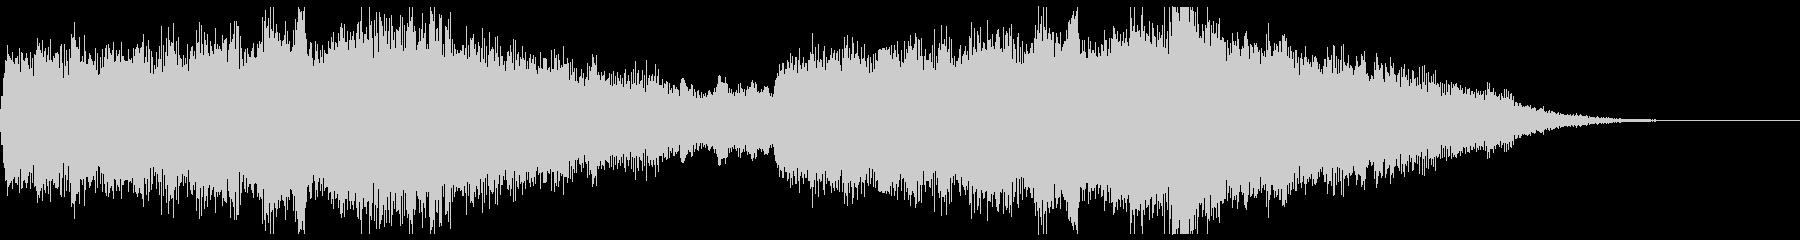 MARVEL風オーケストラジングルの未再生の波形